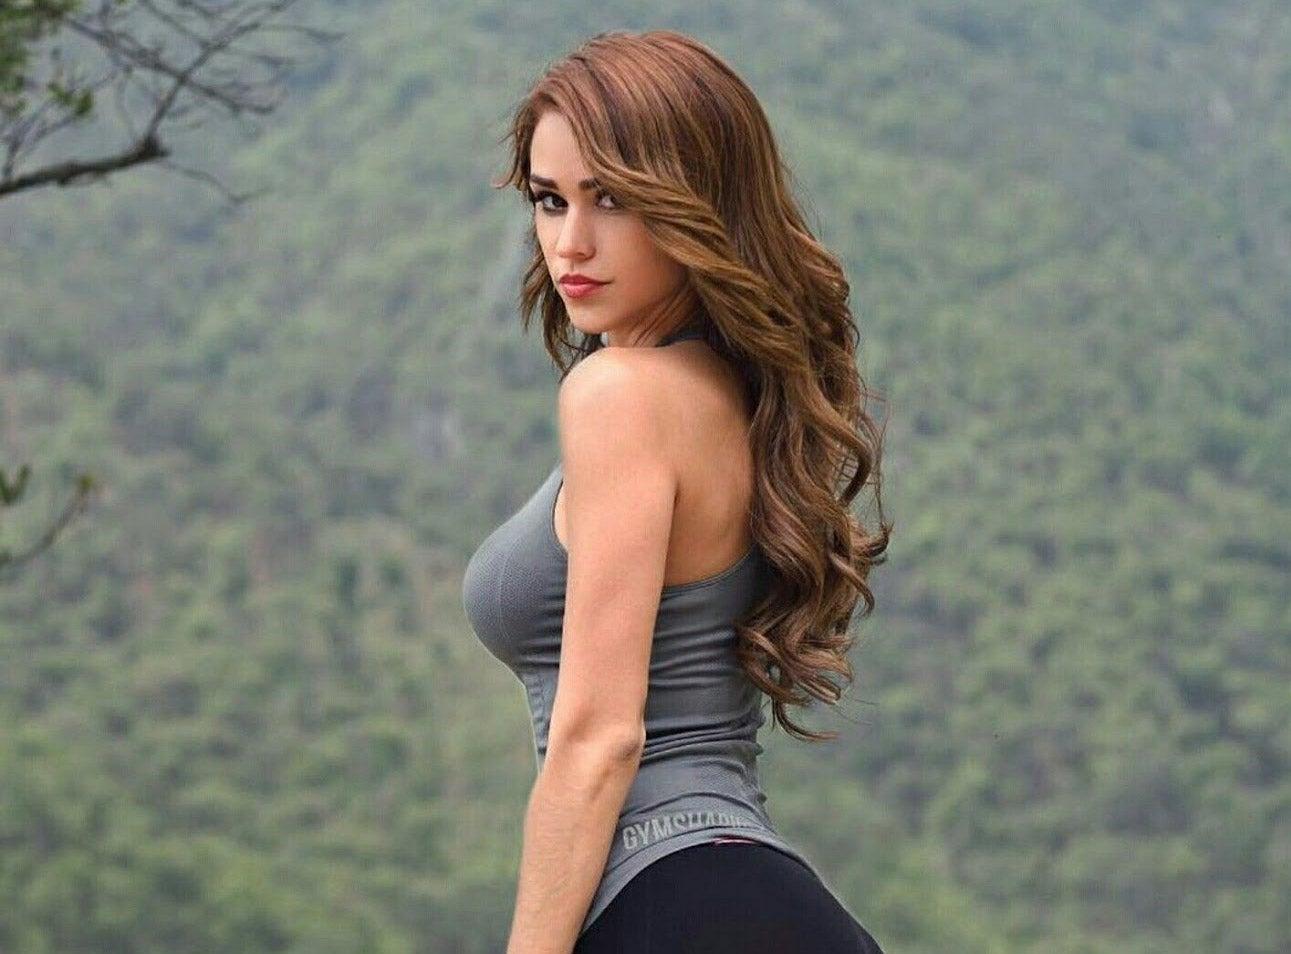 Pics of beautiful women